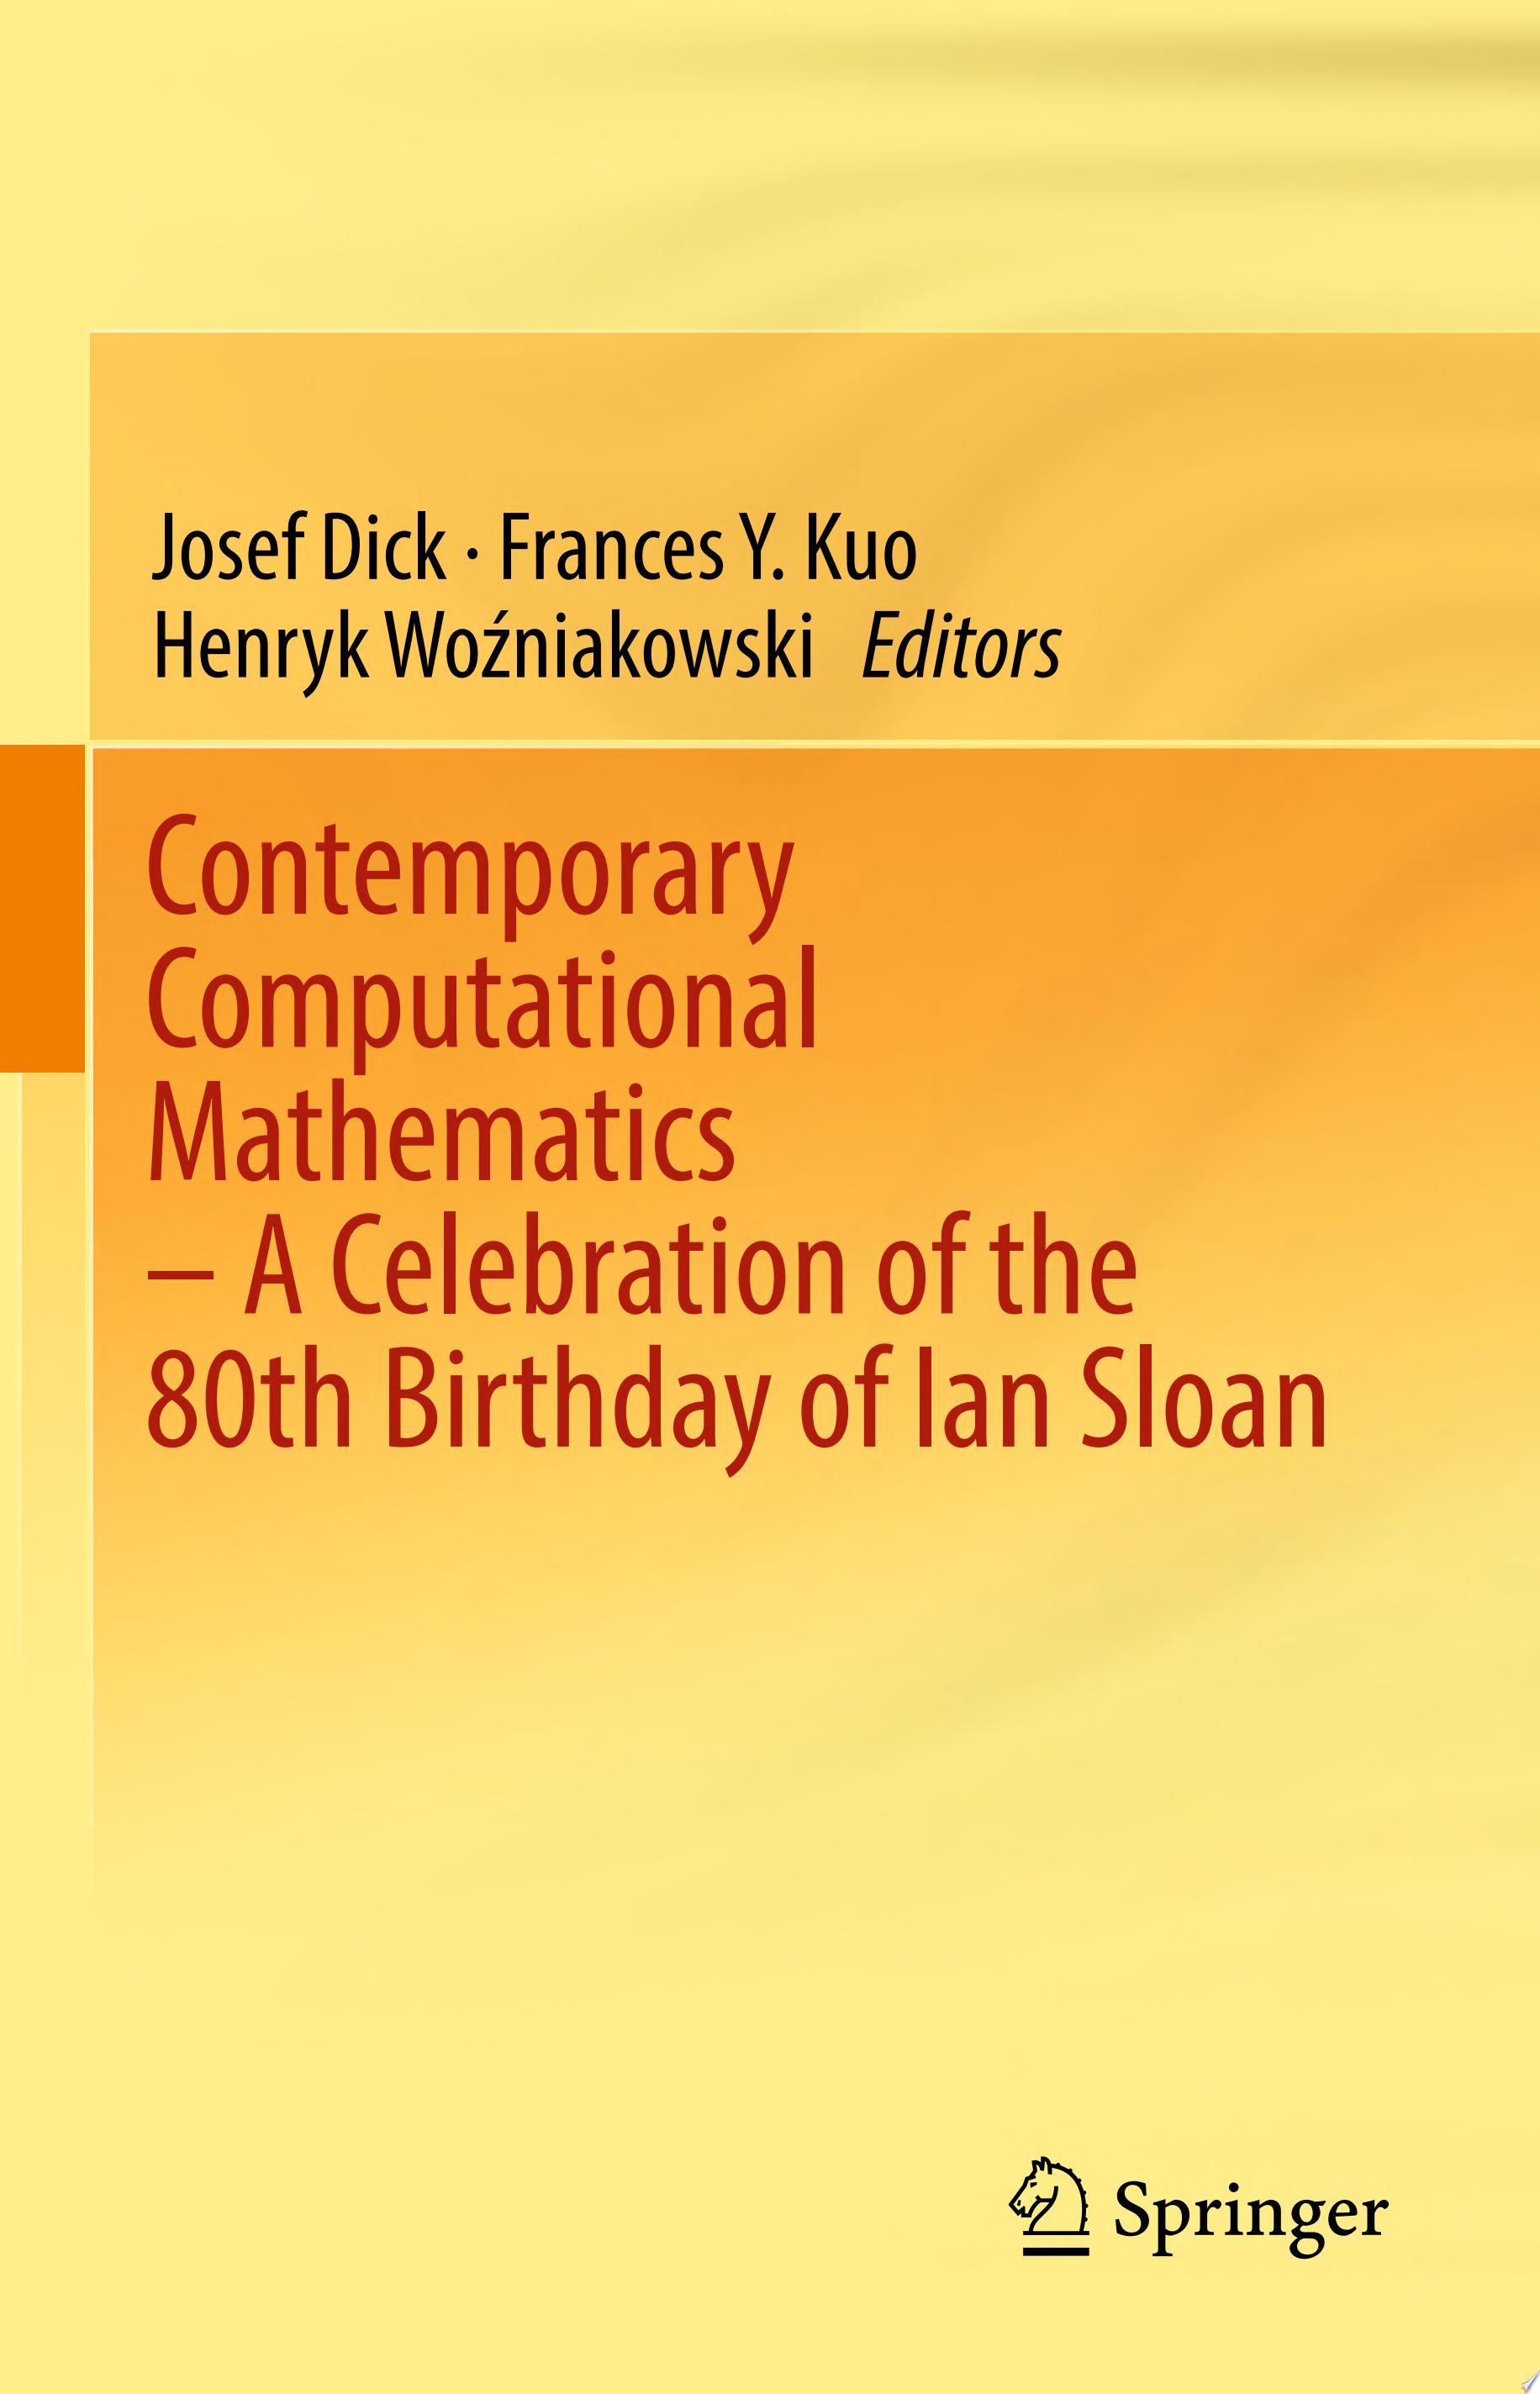 Contemporary Computational Mathematics   A Celebration of the 80th Birthday of Ian Sloan